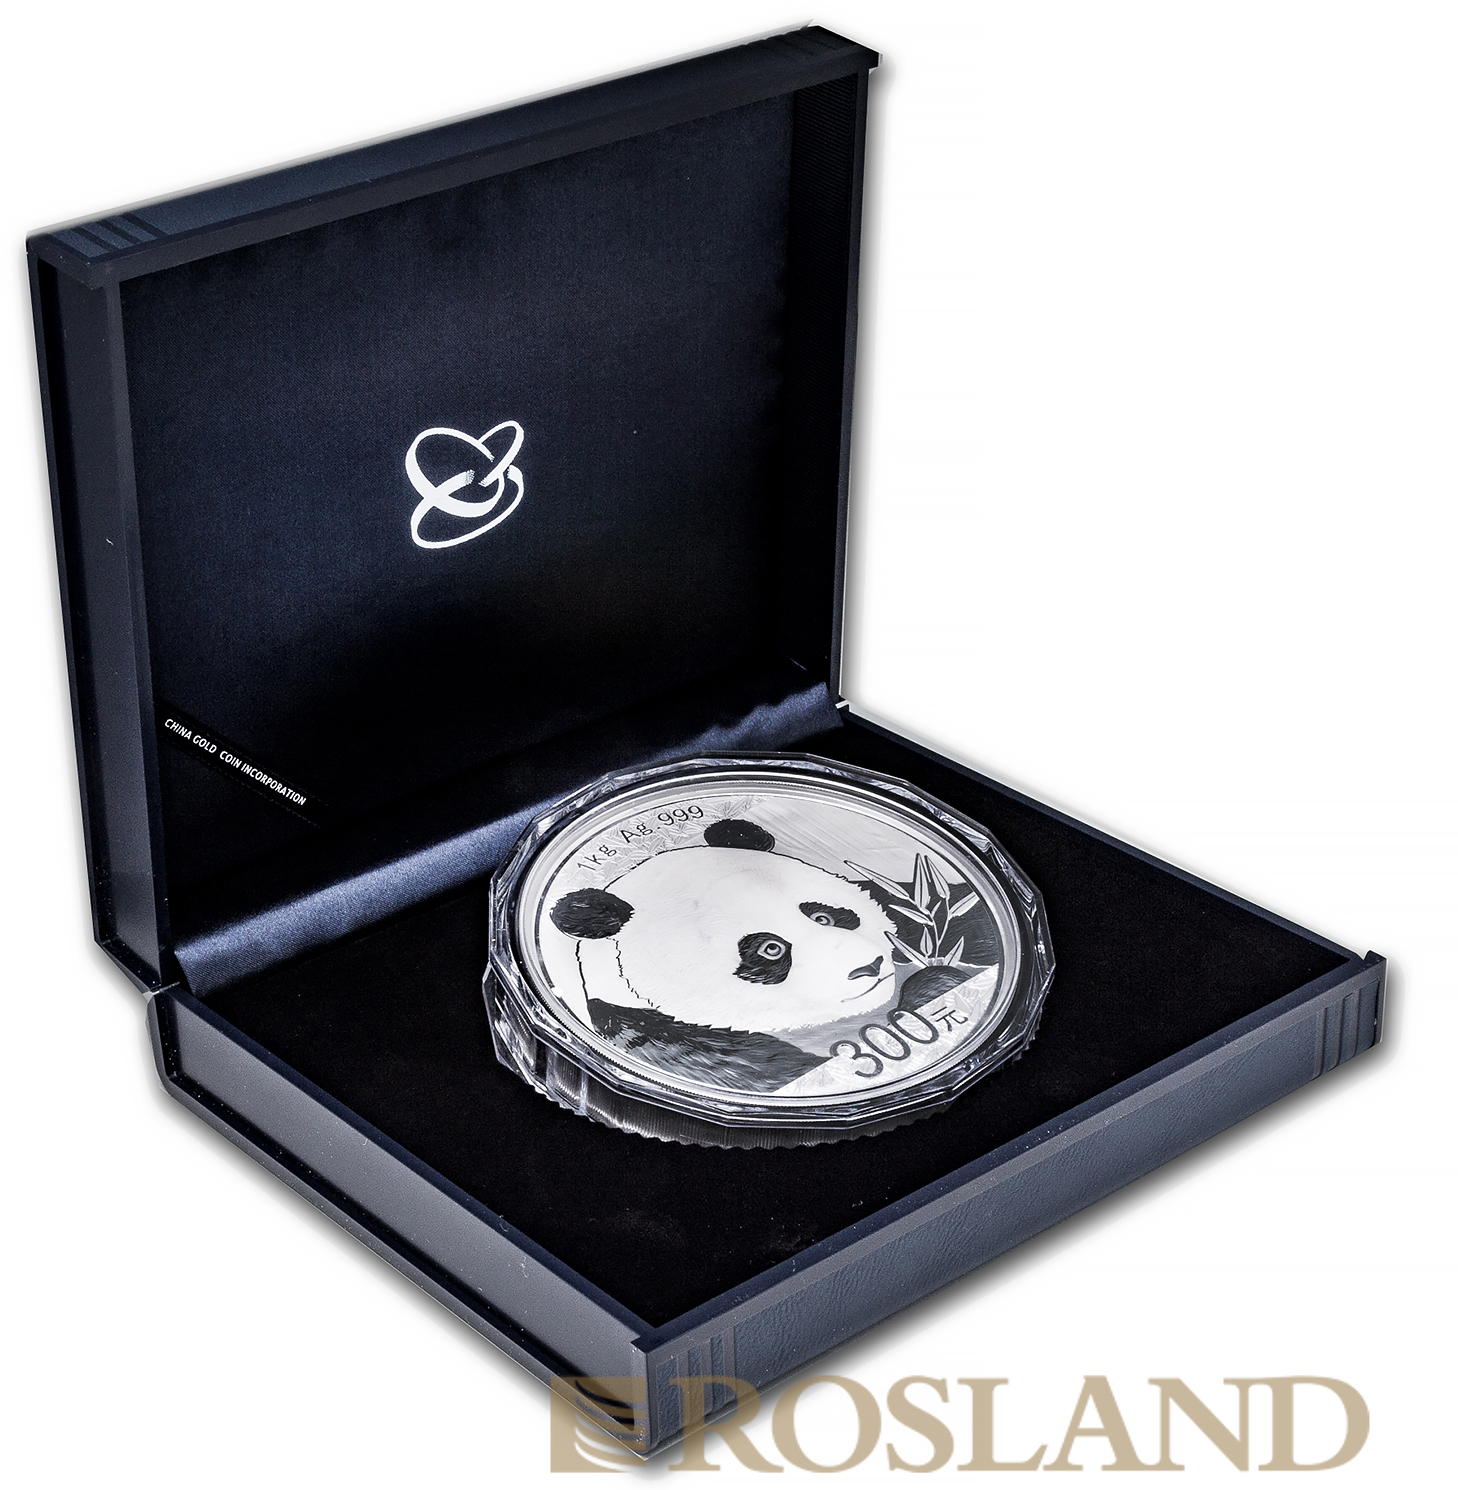 1 Kilogramm Silbermünze China Panda 2018 PP (Box, Zertifikat)